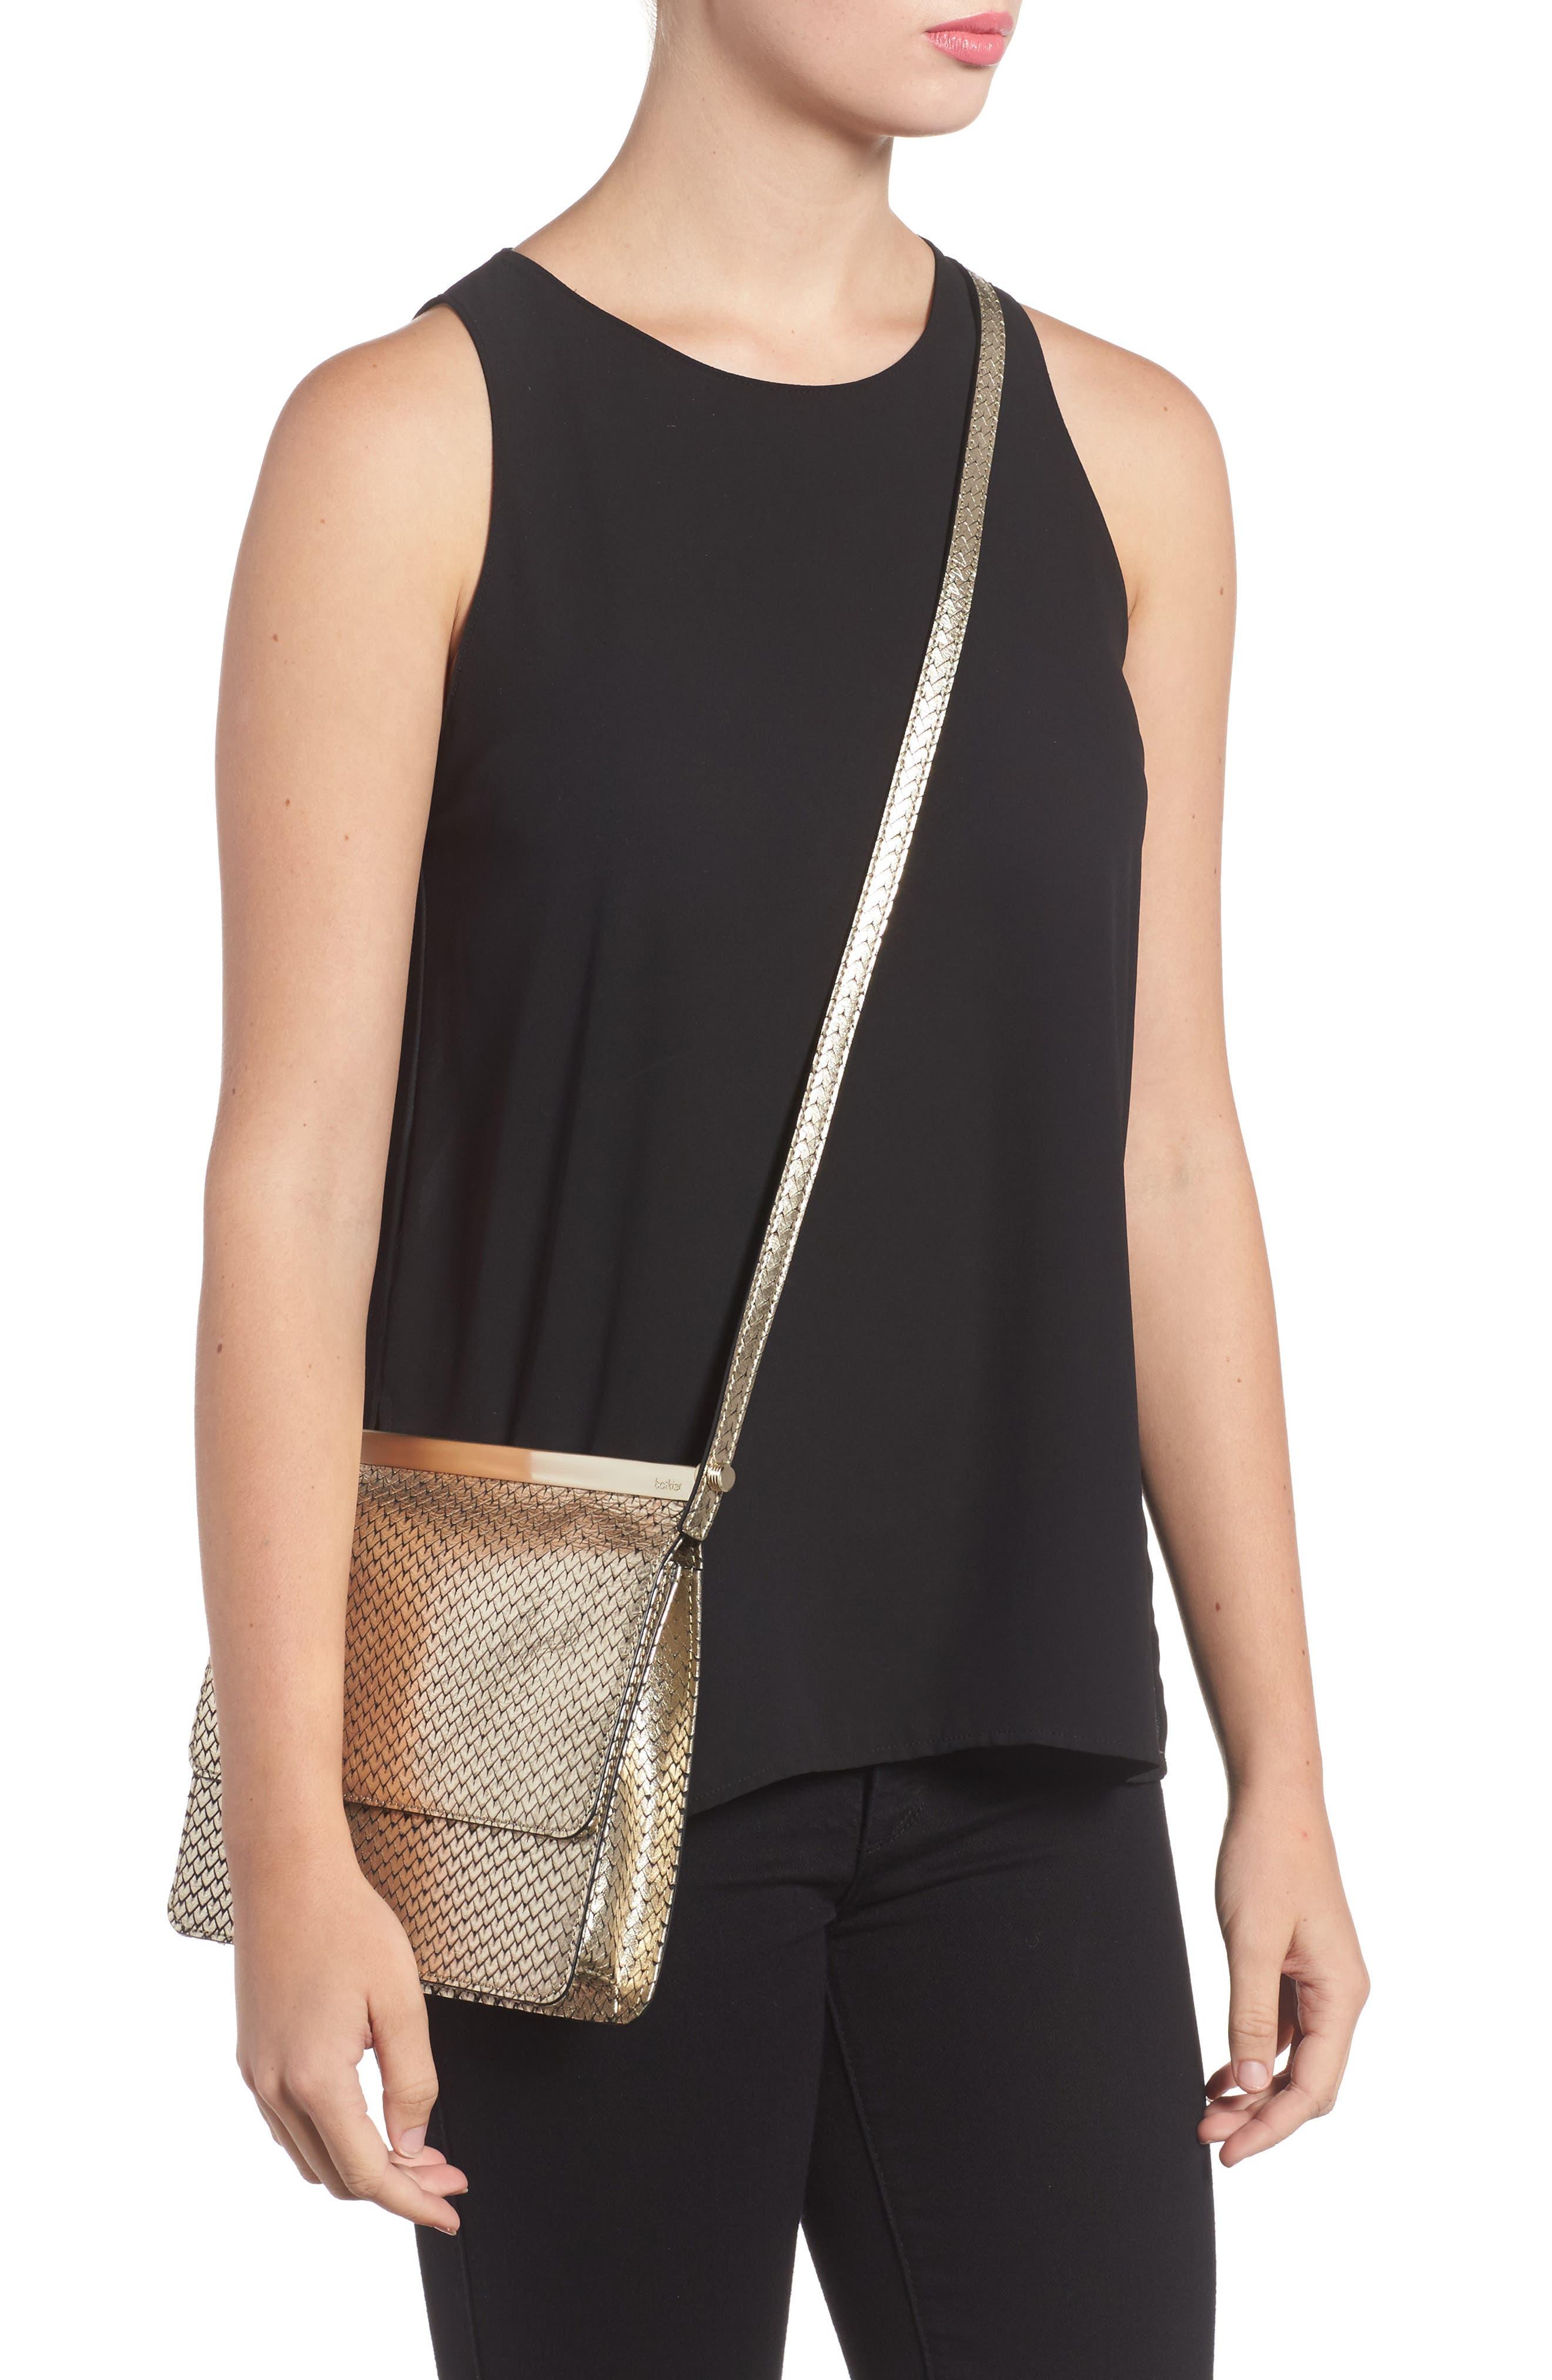 Crawford Calfskin Leather Crossbody Bag,                             Alternate thumbnail 6, color,